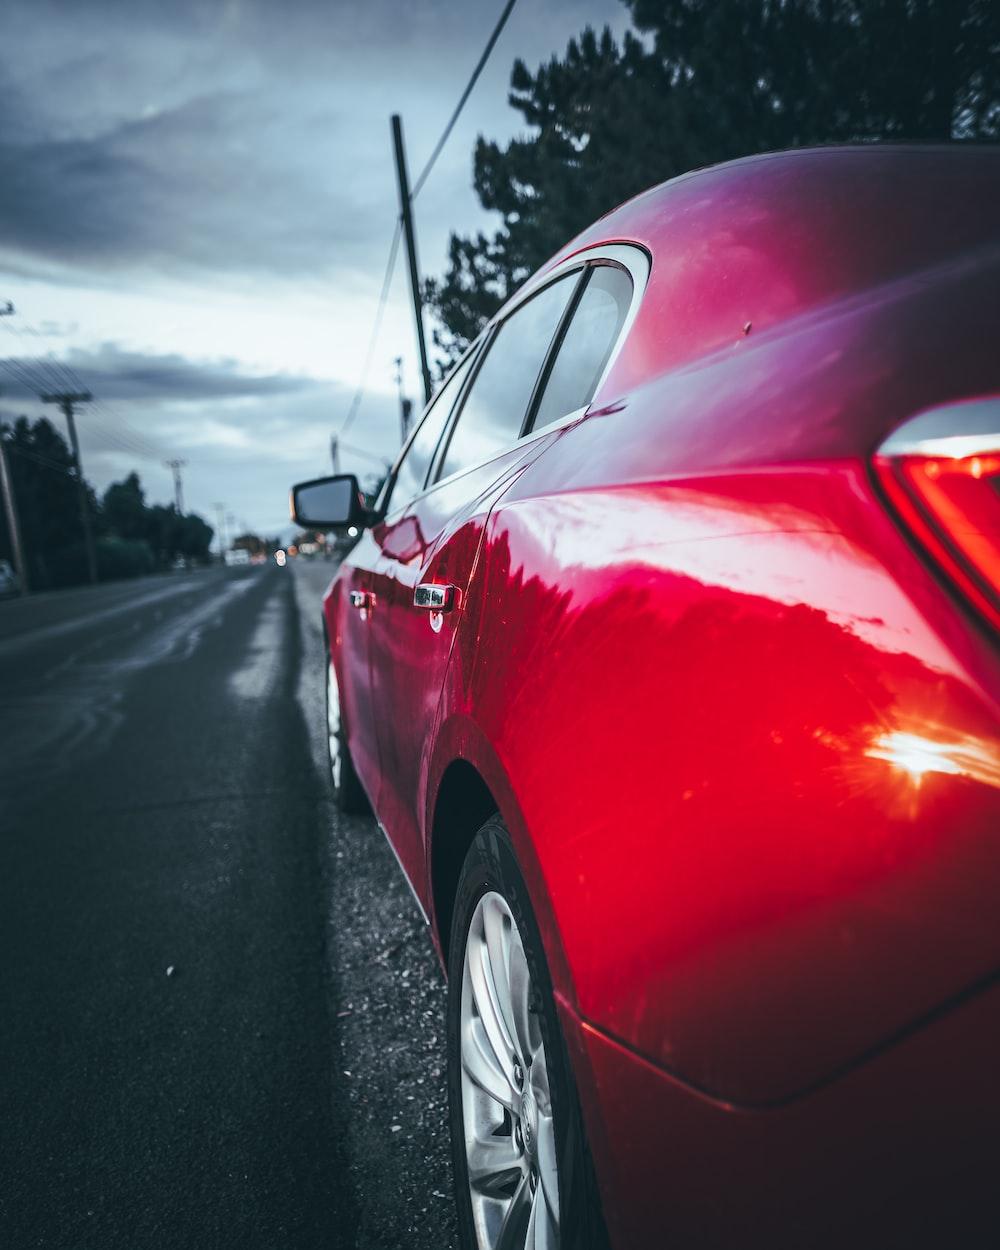 red sedan on road near utility pole